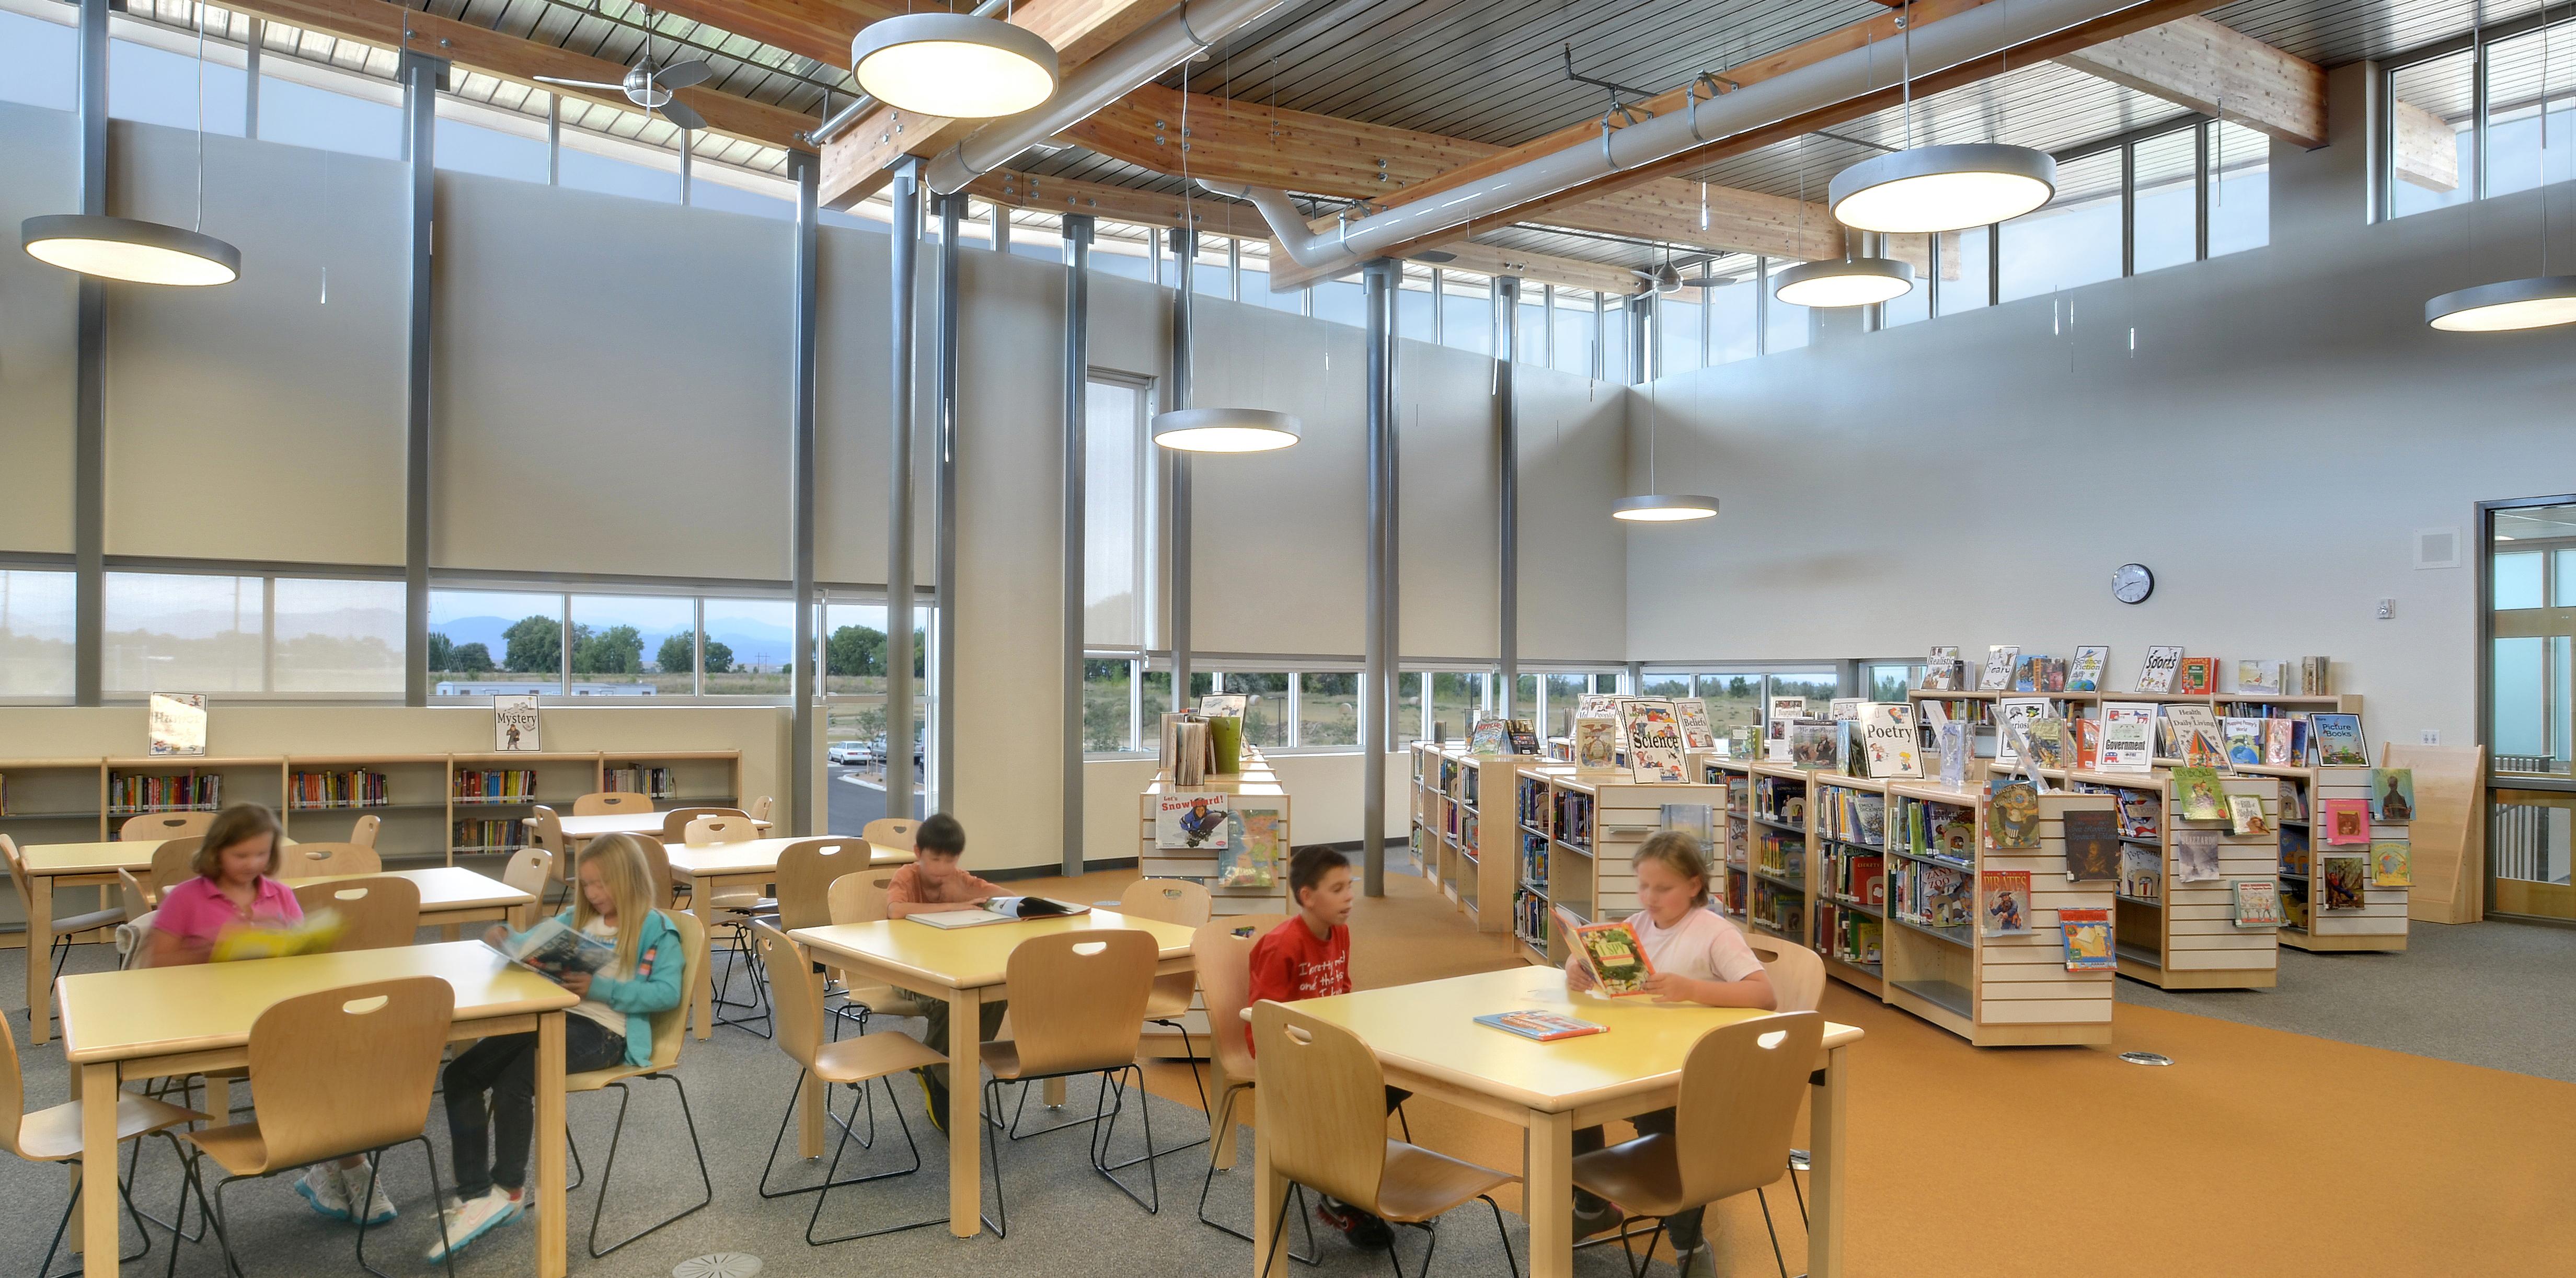 Red Hawk Elementary School 3